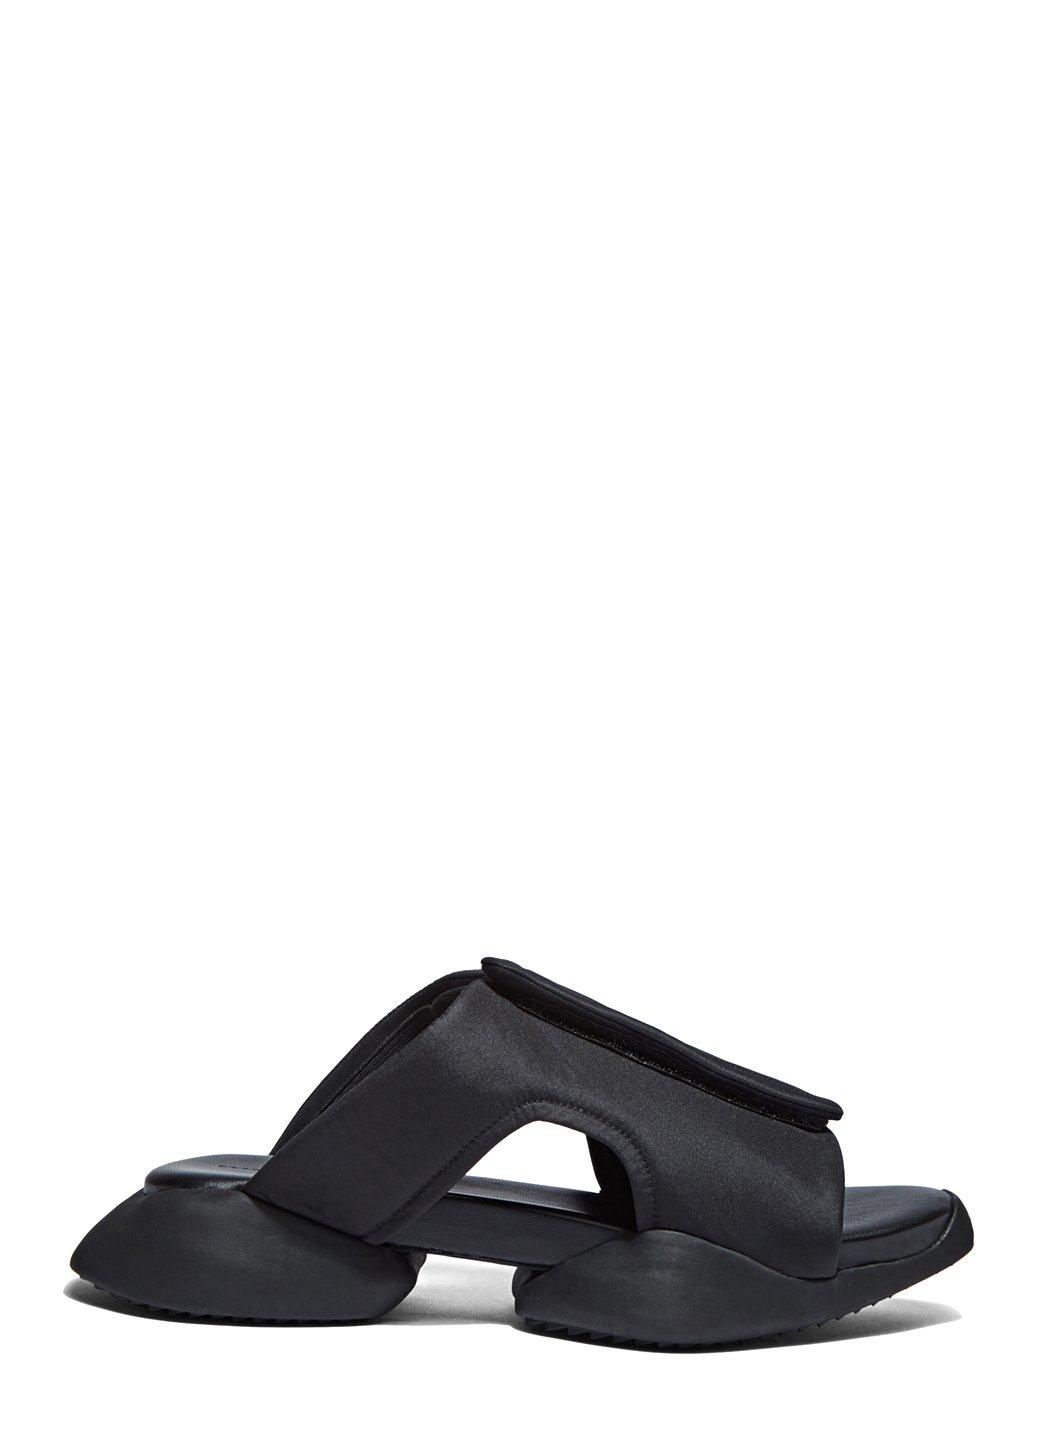 49499c8fb121d Lyst - Rick Owens X Adidas Women s Velcro Strap Ro Clog Sandals In ...